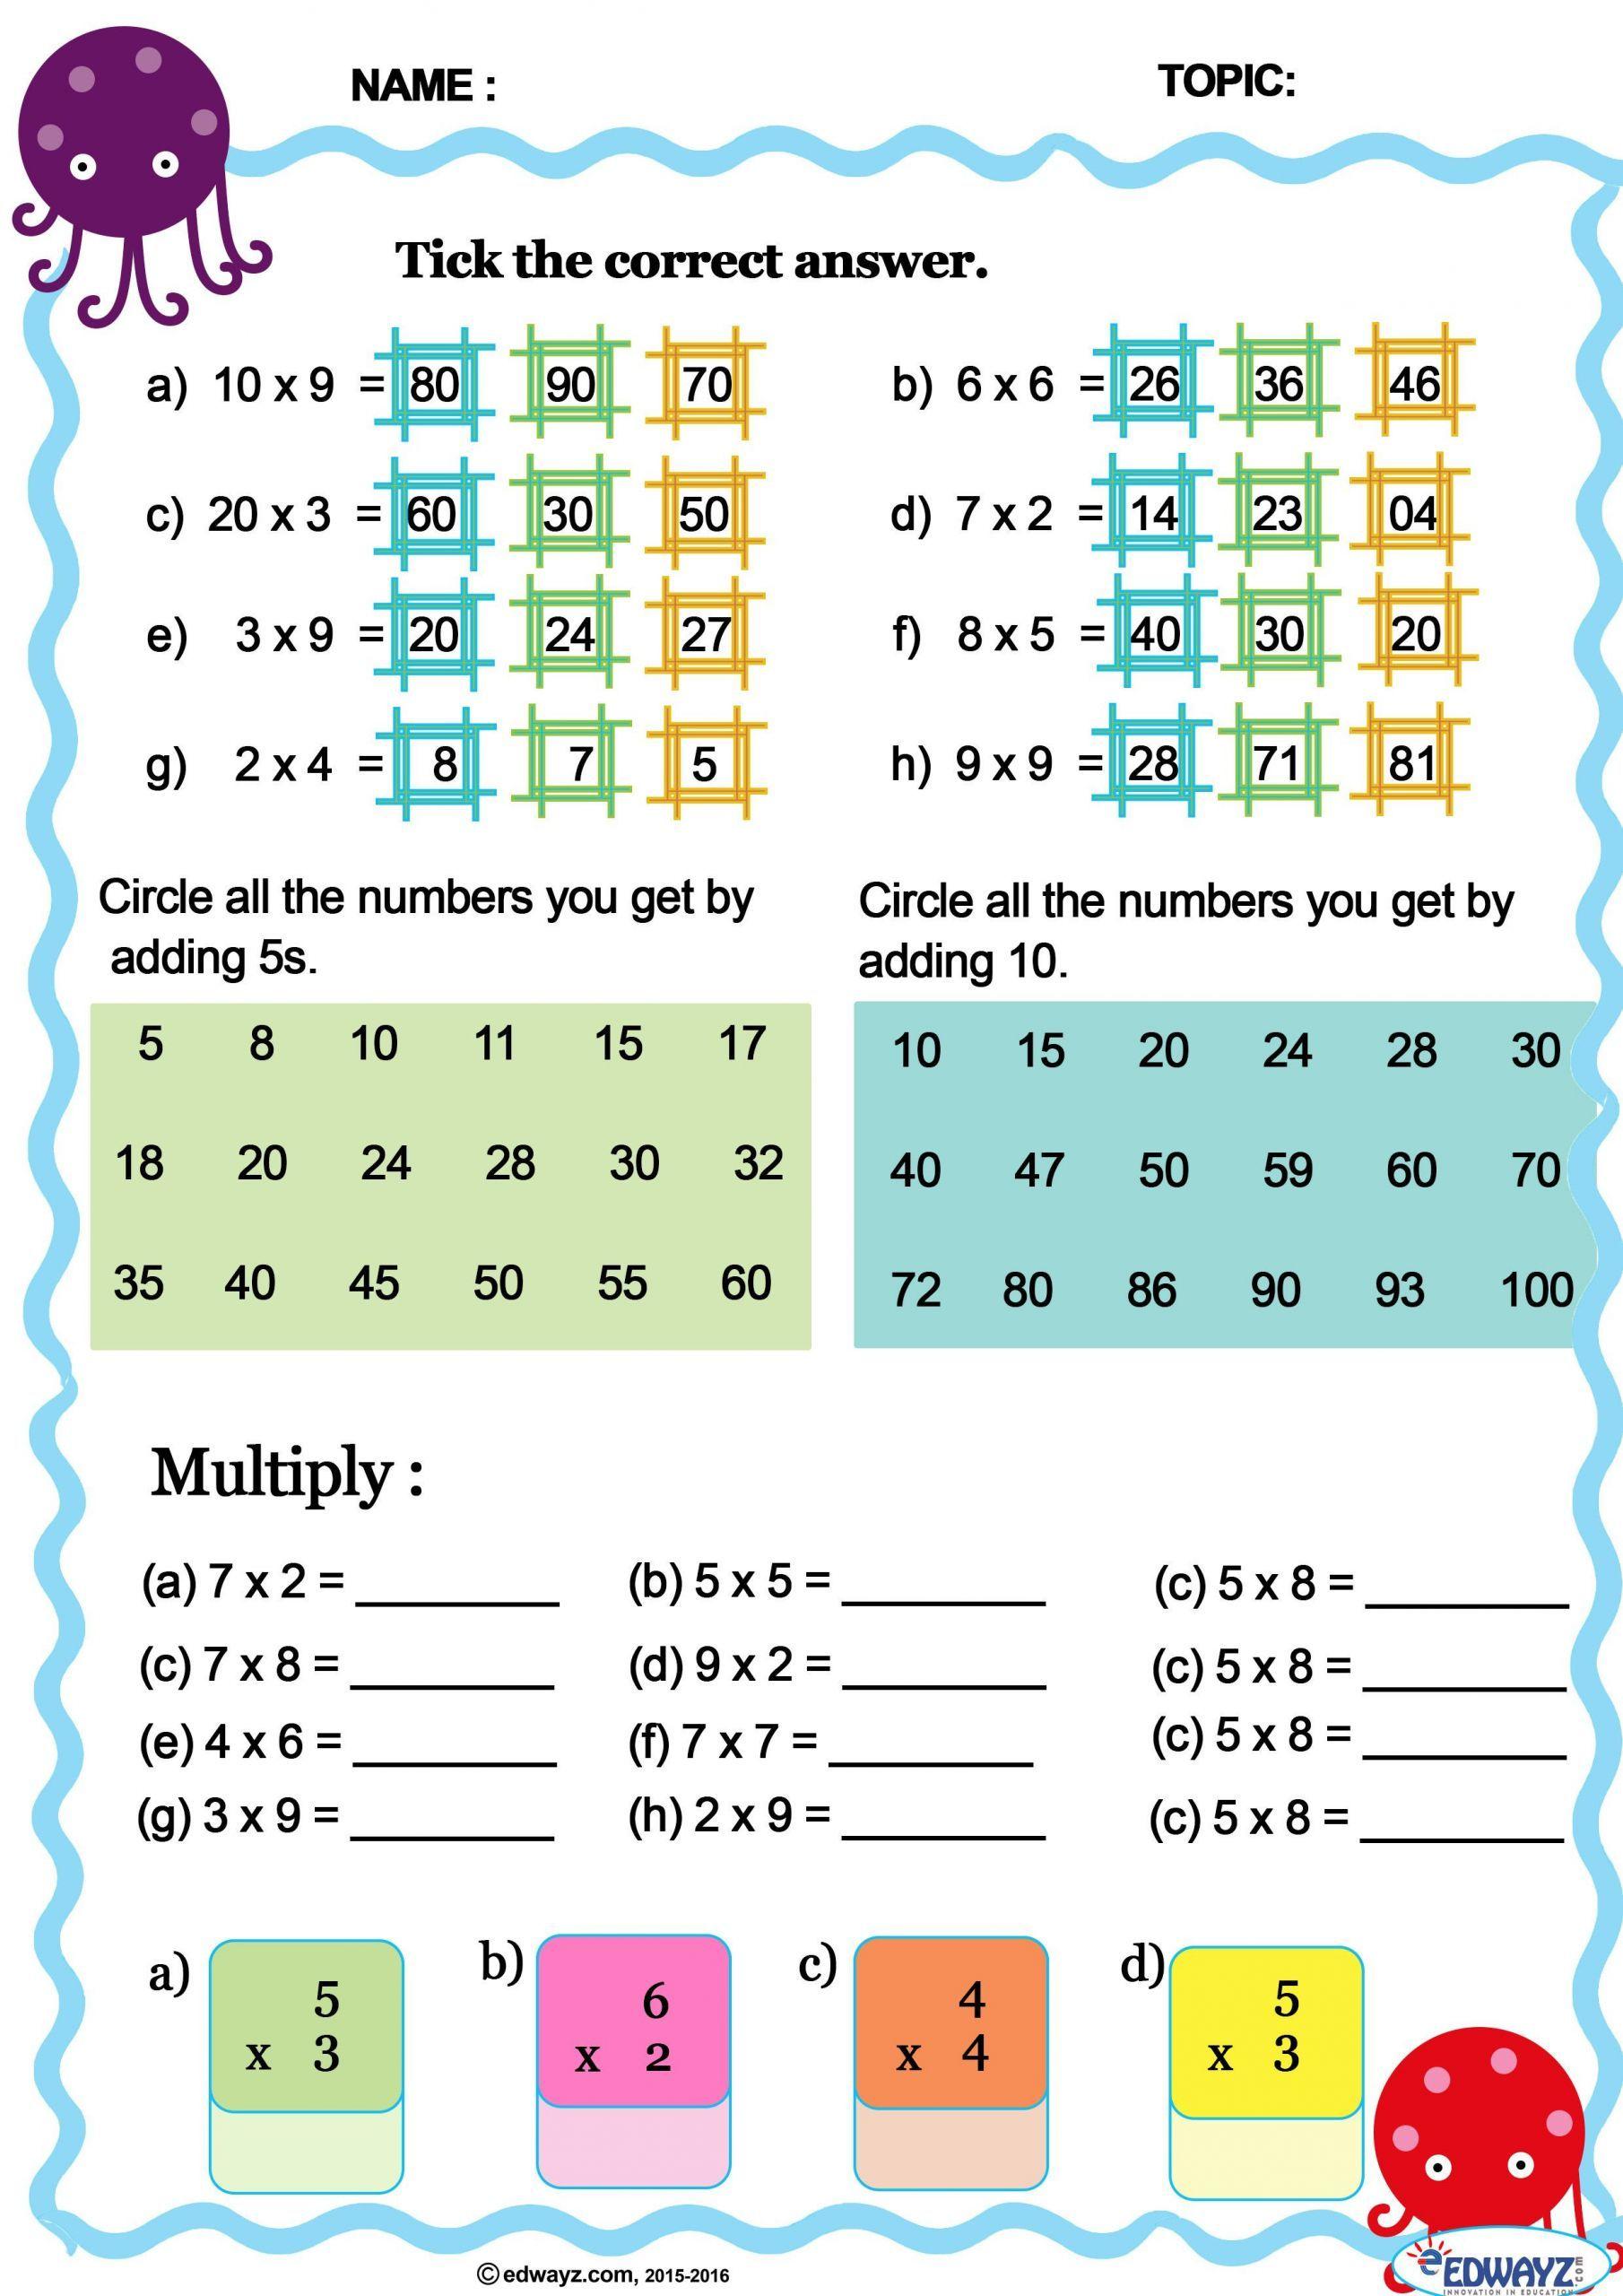 small resolution of 5 Free Math Worksheets Third Grade 3 Multiplication Multiplication Table 7  8 0101b65e8ad…   First grade math worksheets